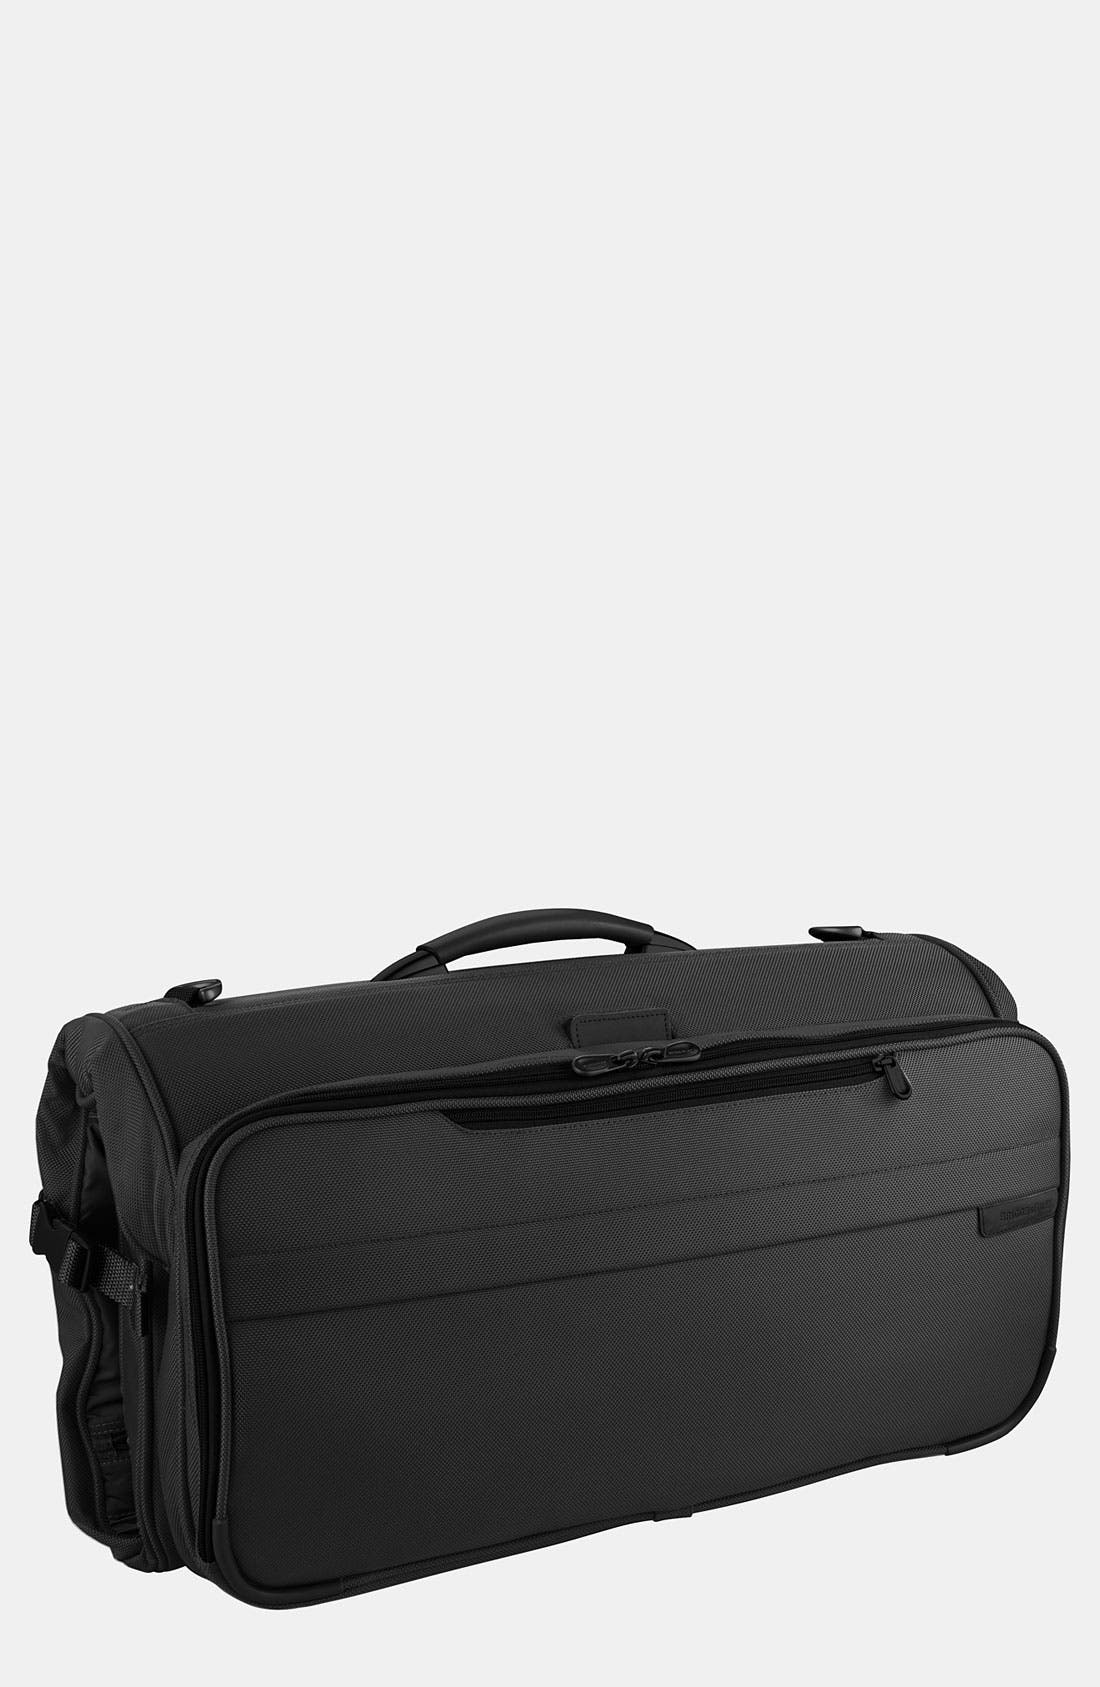 Briggs & Riley Baseline - Compact Garment Bag